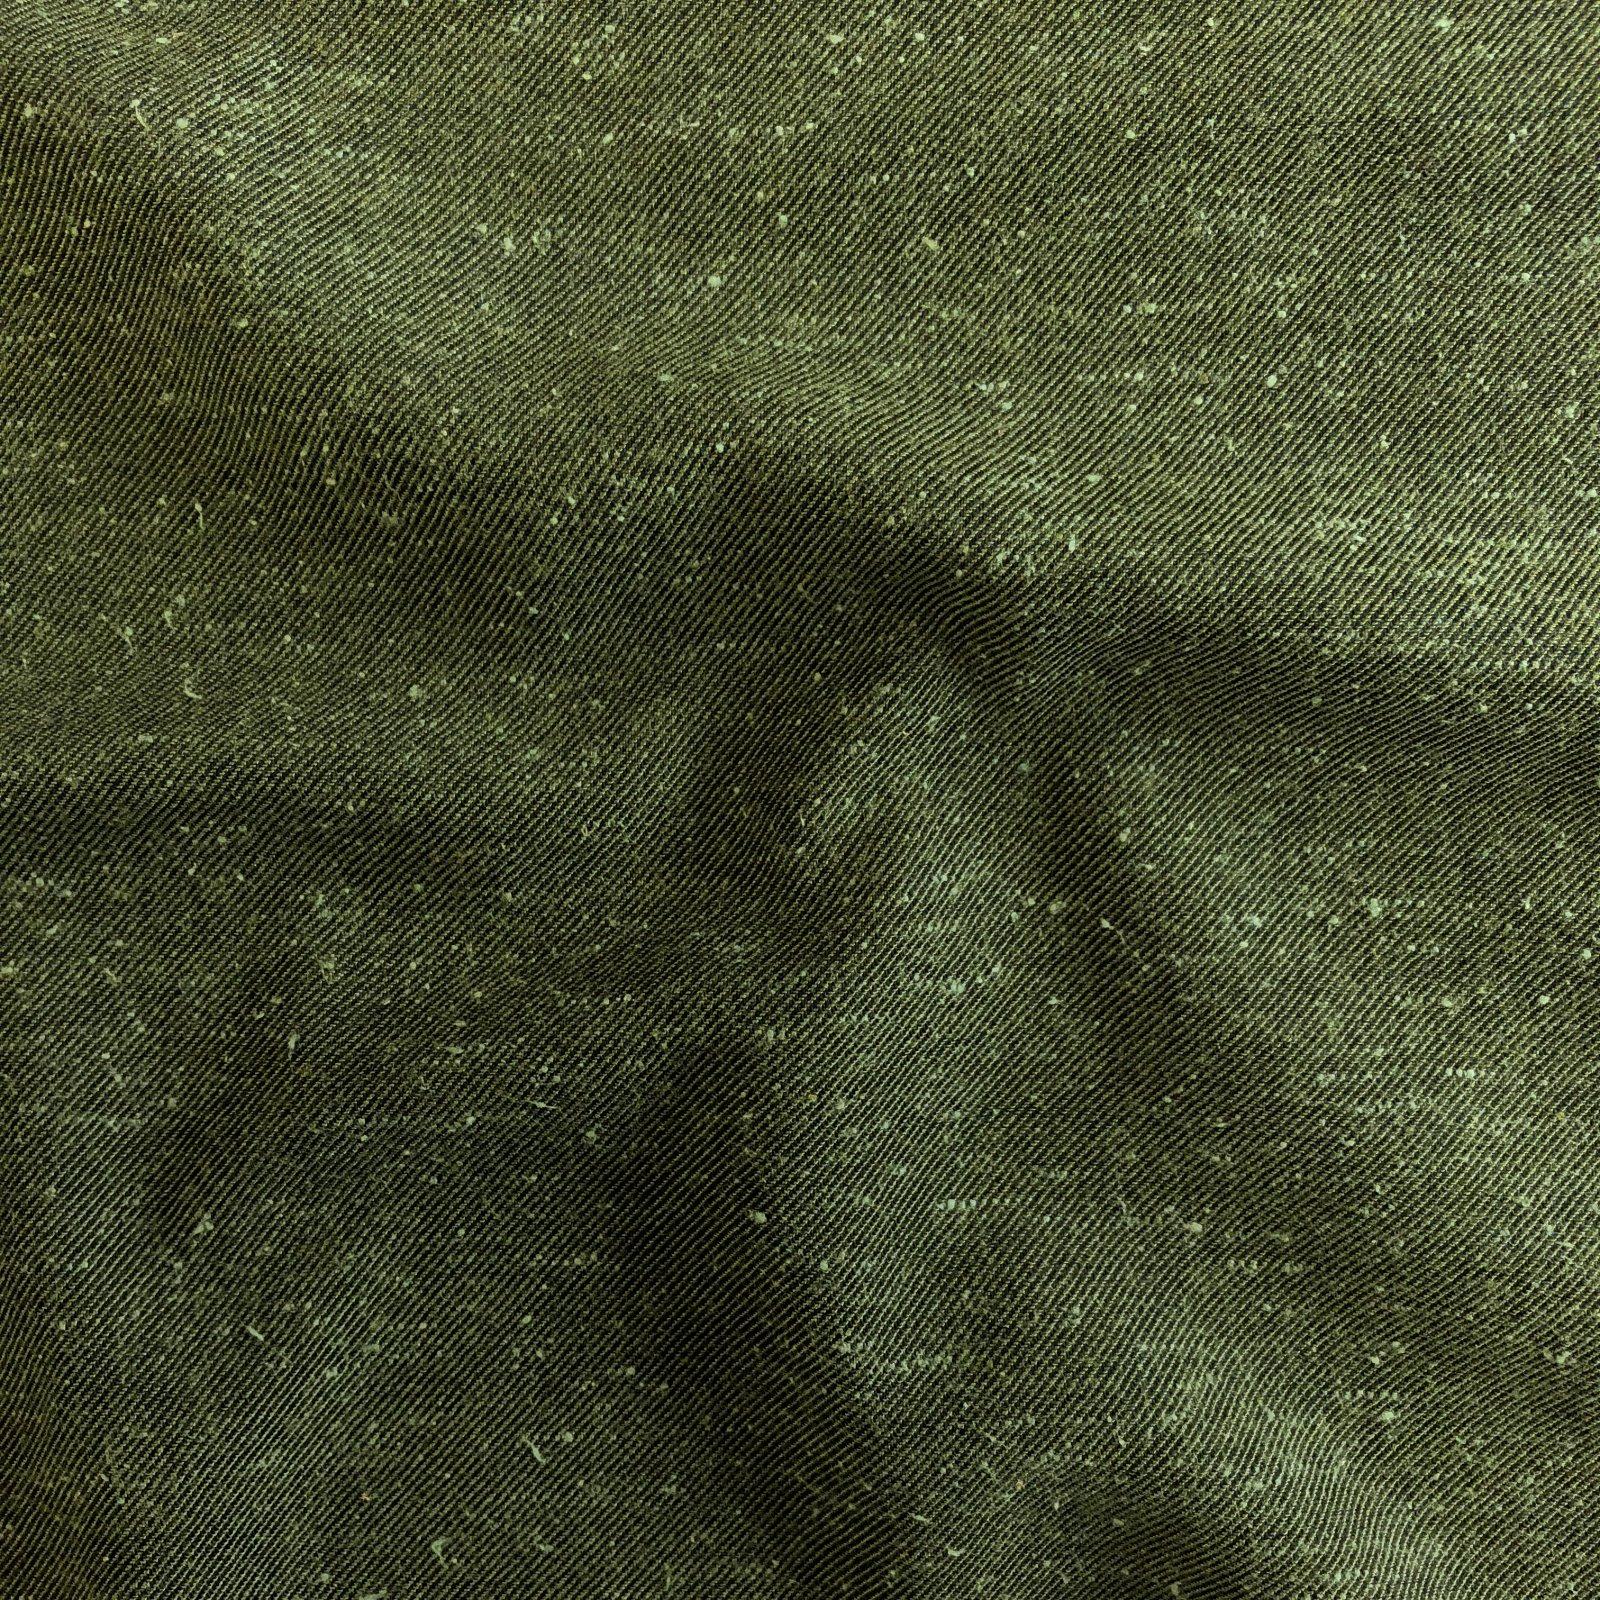 Japanese Yarn Dyed Twill - Seaweed